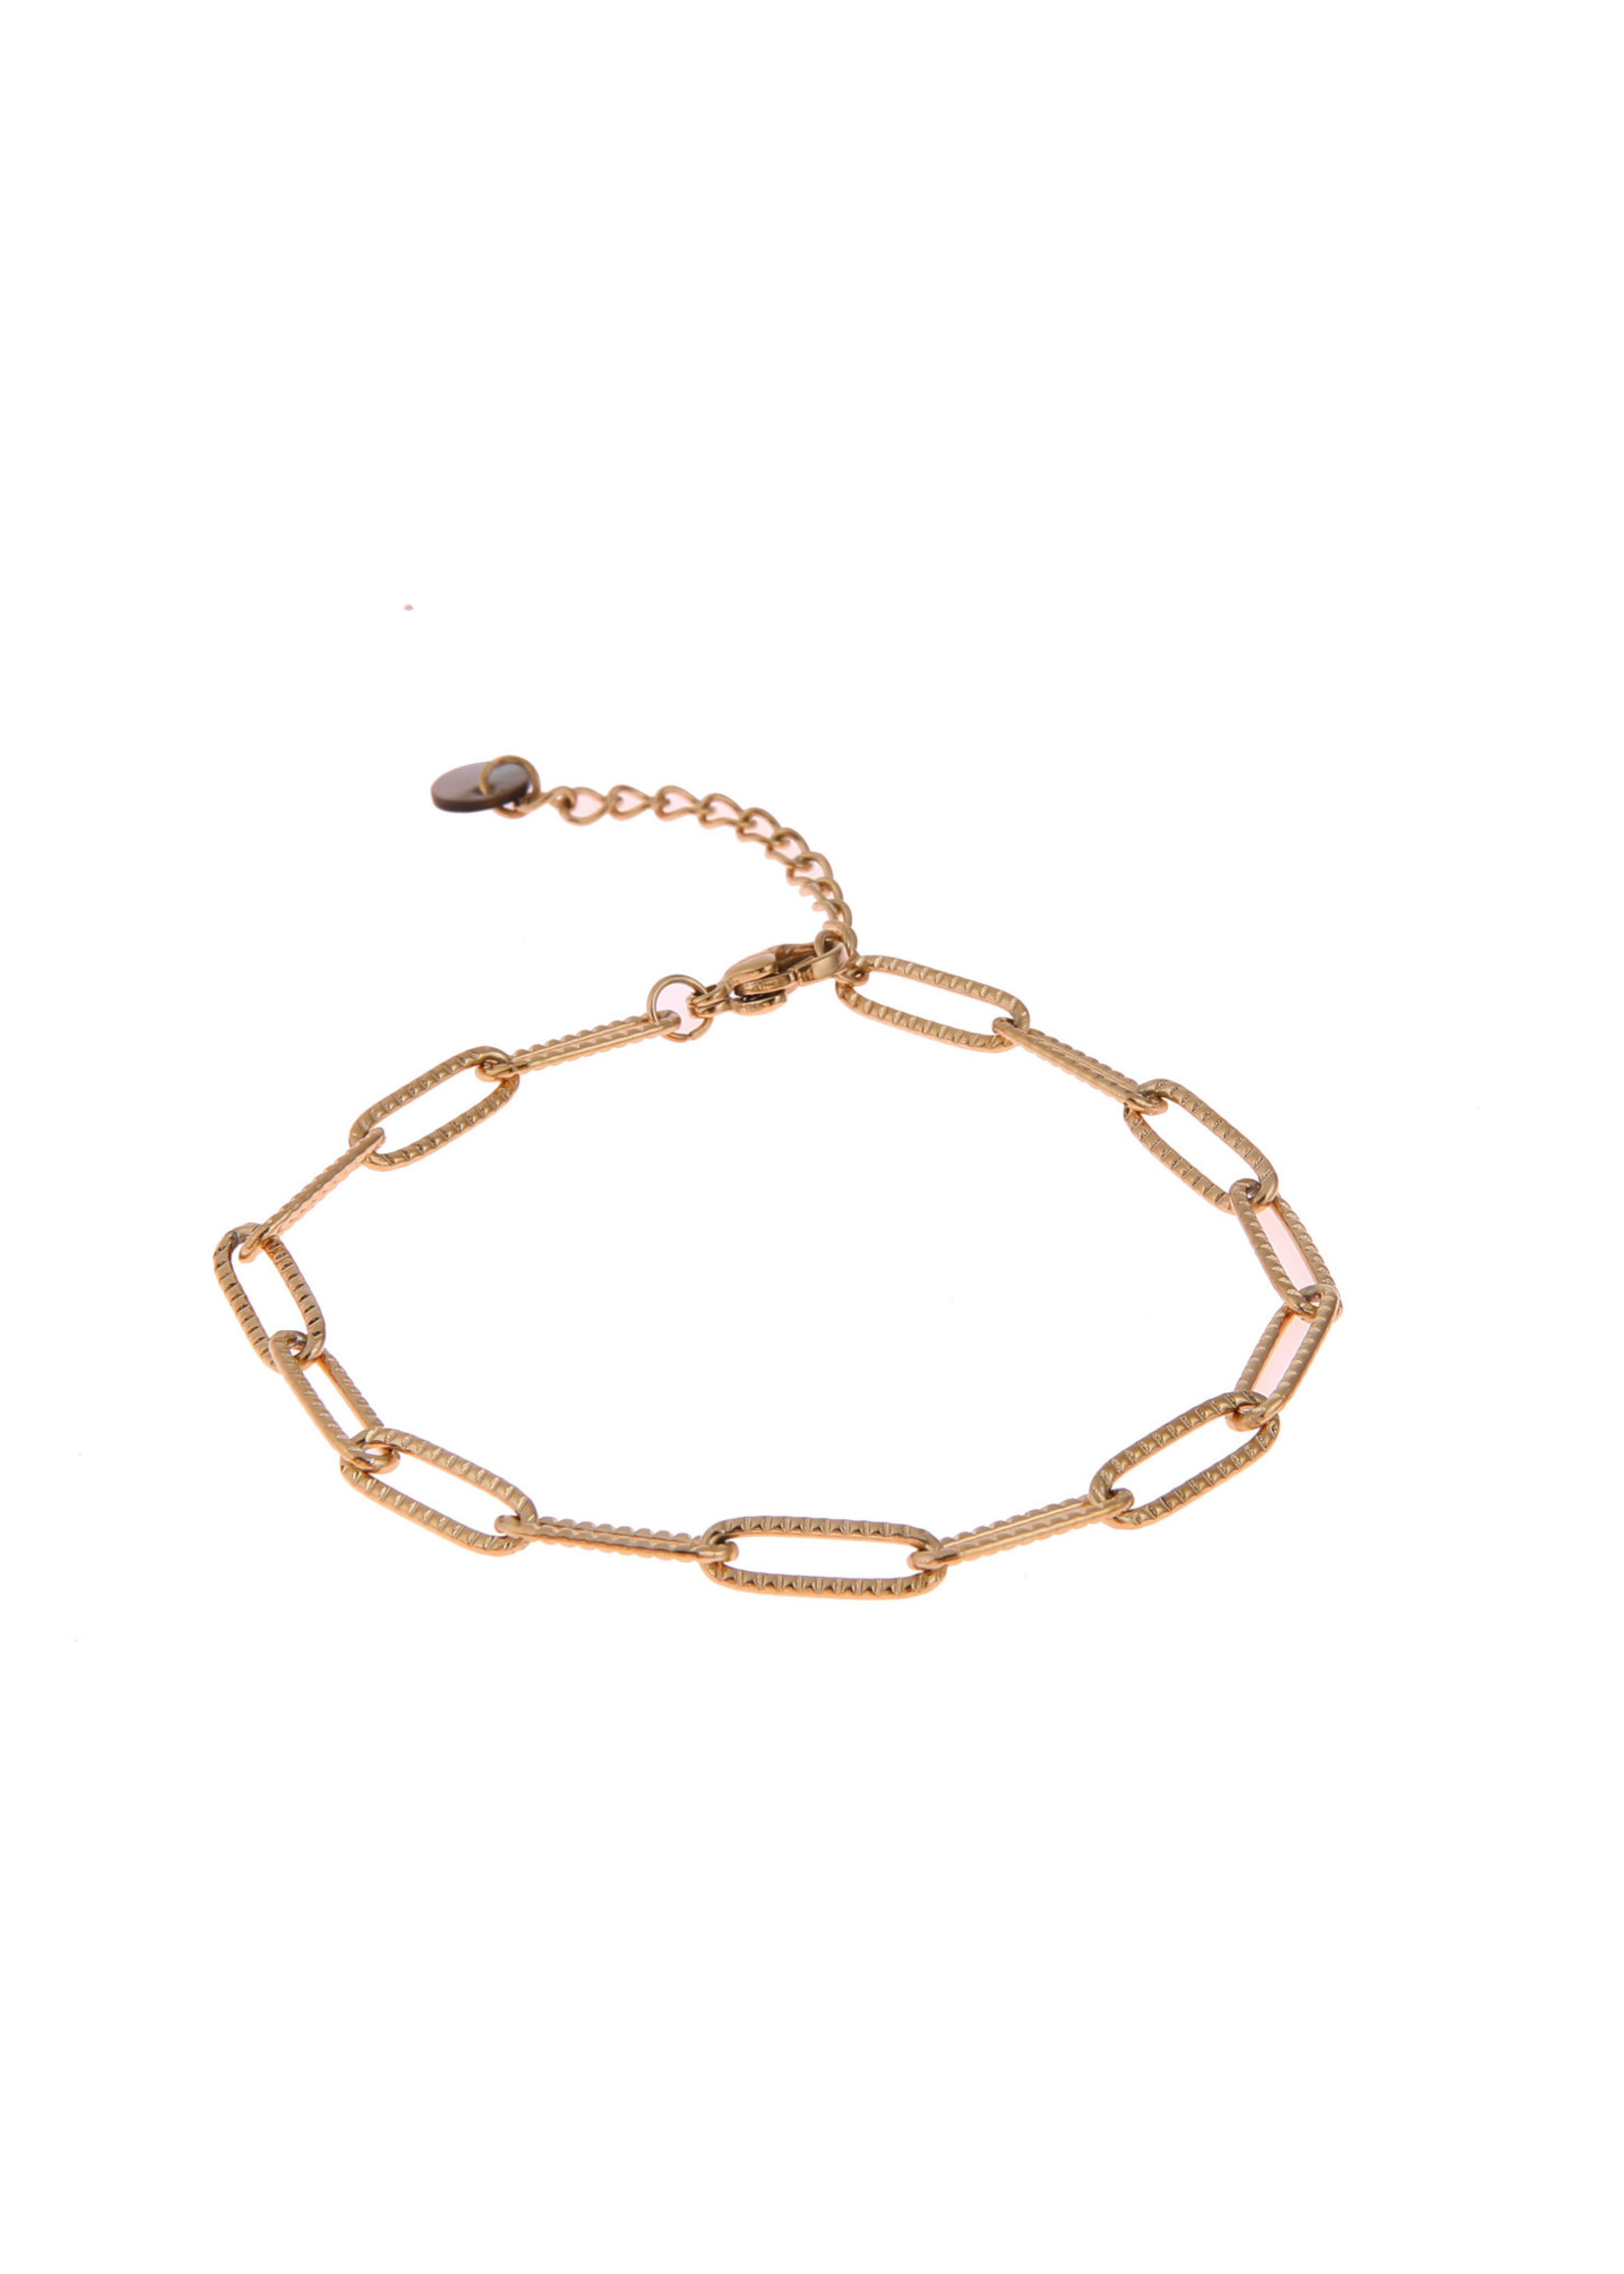 Armband goud ovale schakel gewerkt B0887-2